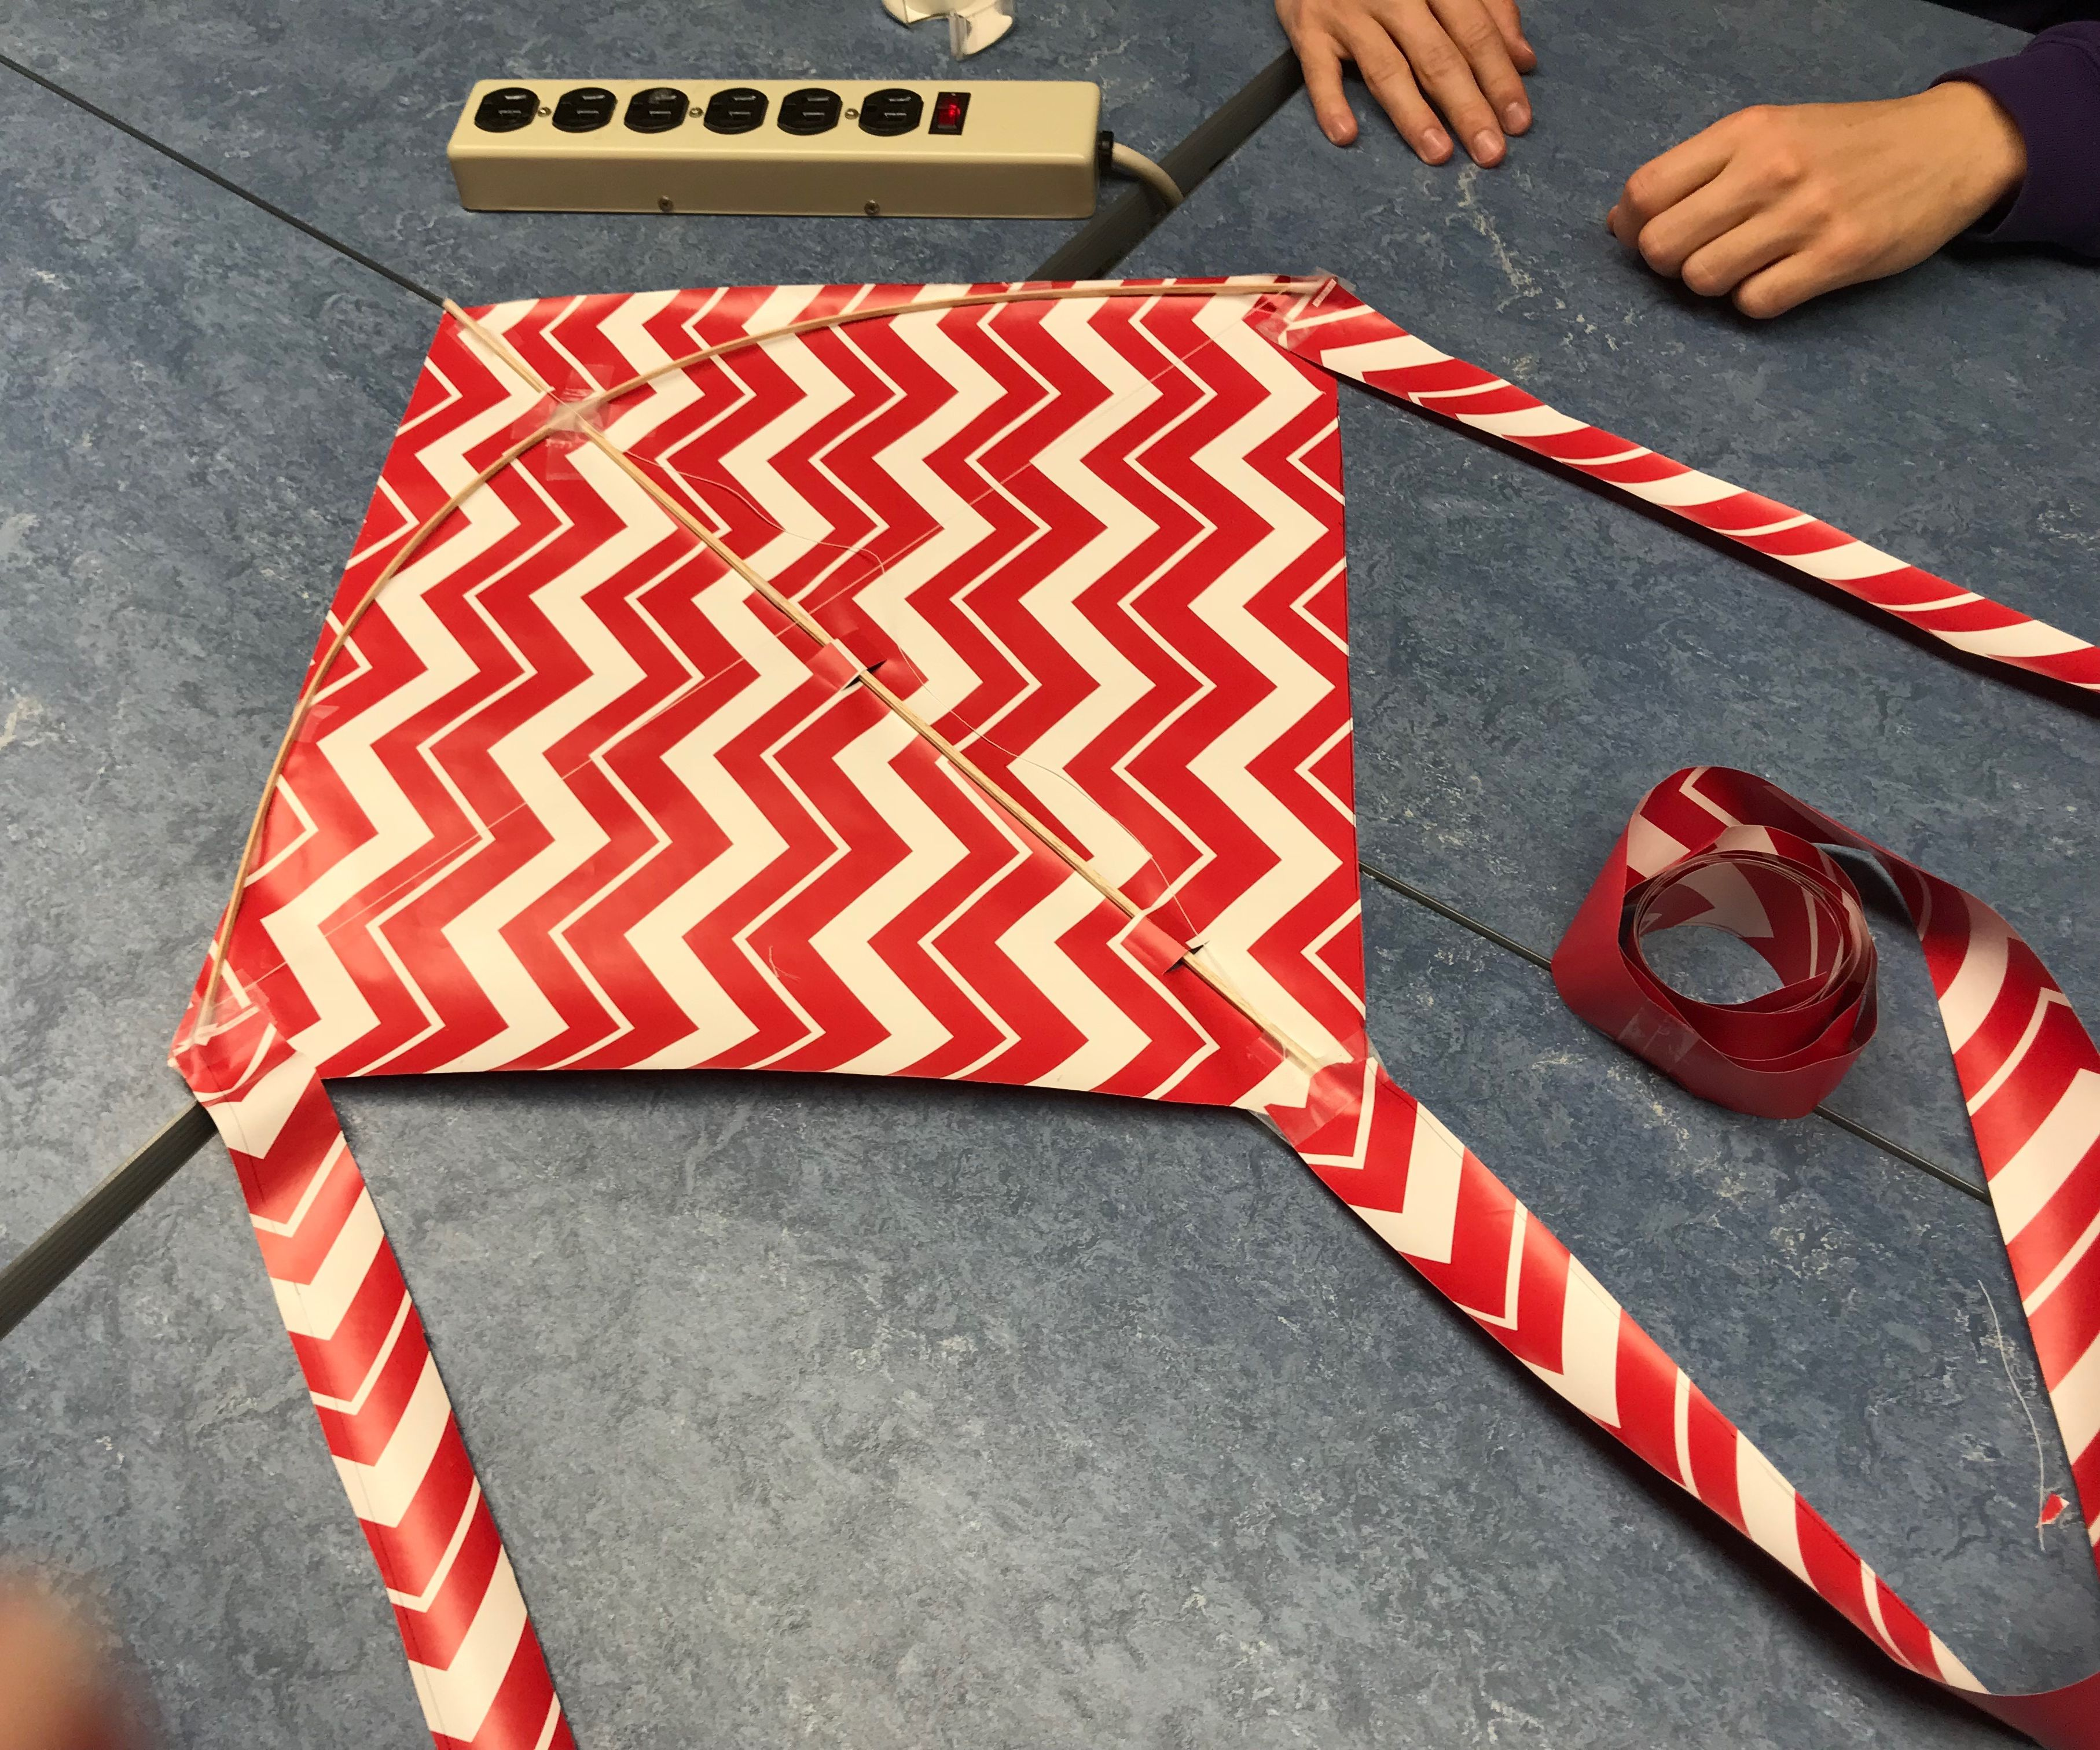 DIY Wrapping Paper Kite